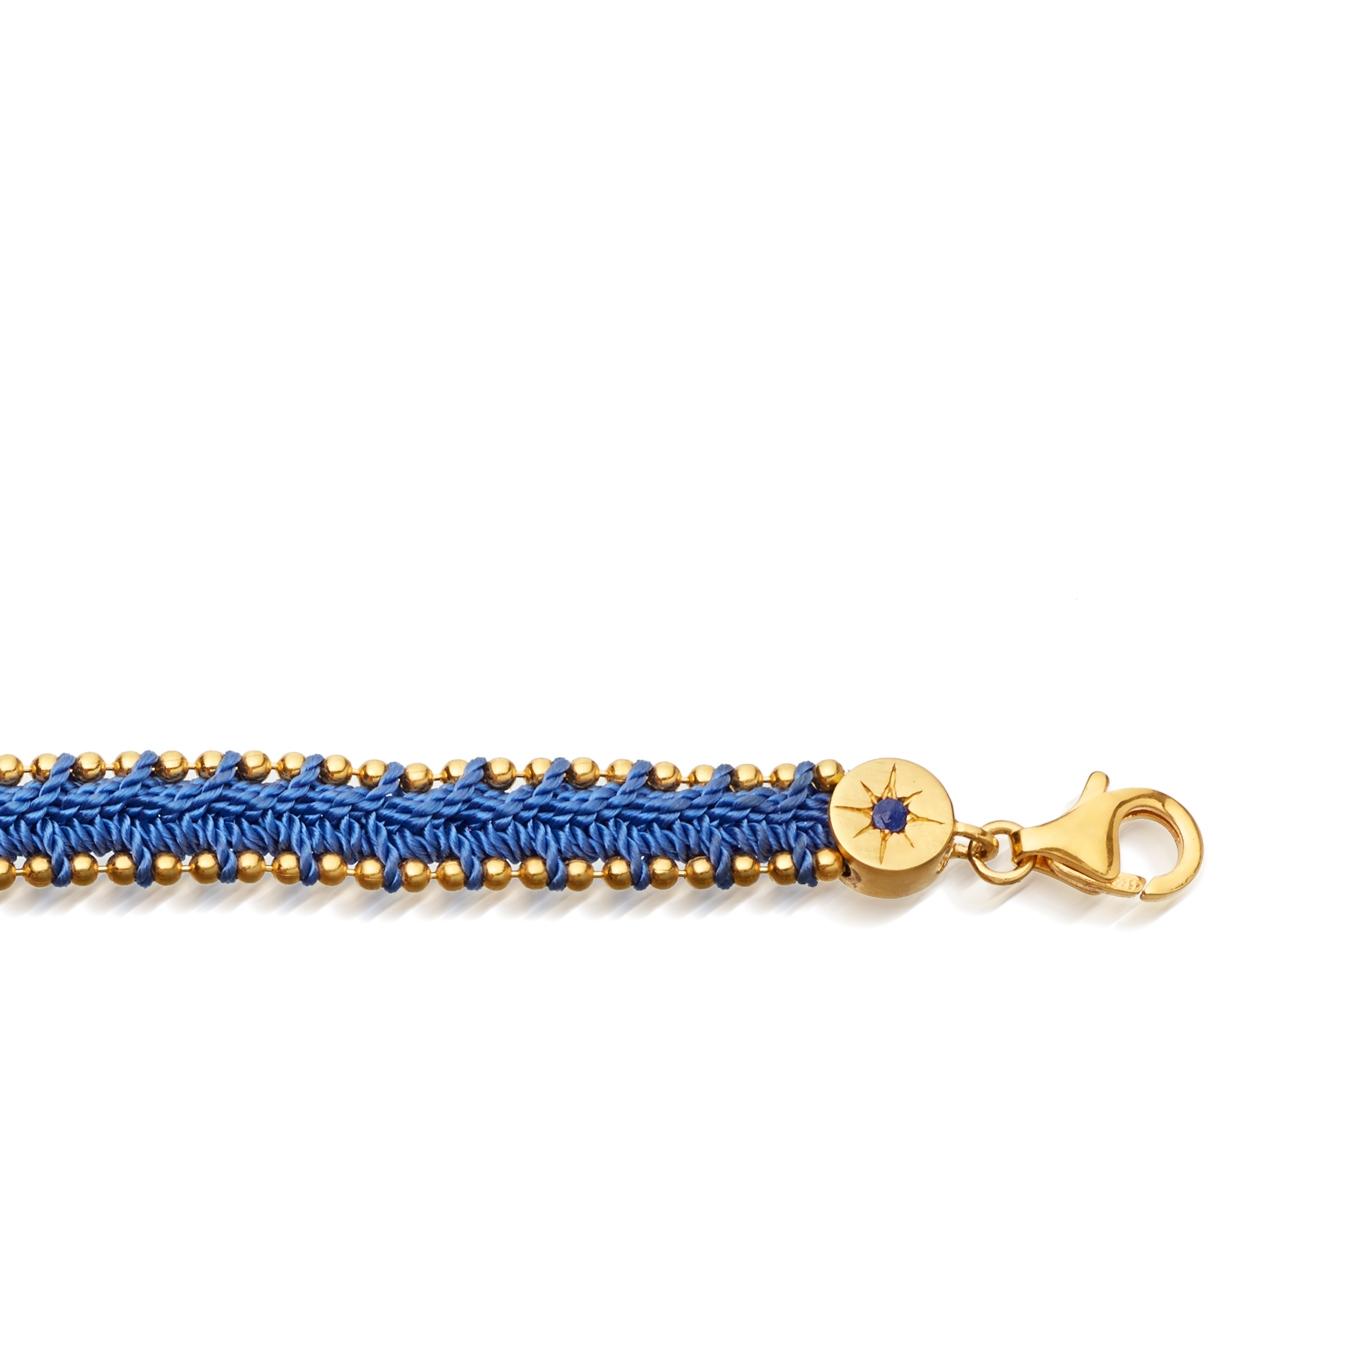 Woven Biography Bracelet